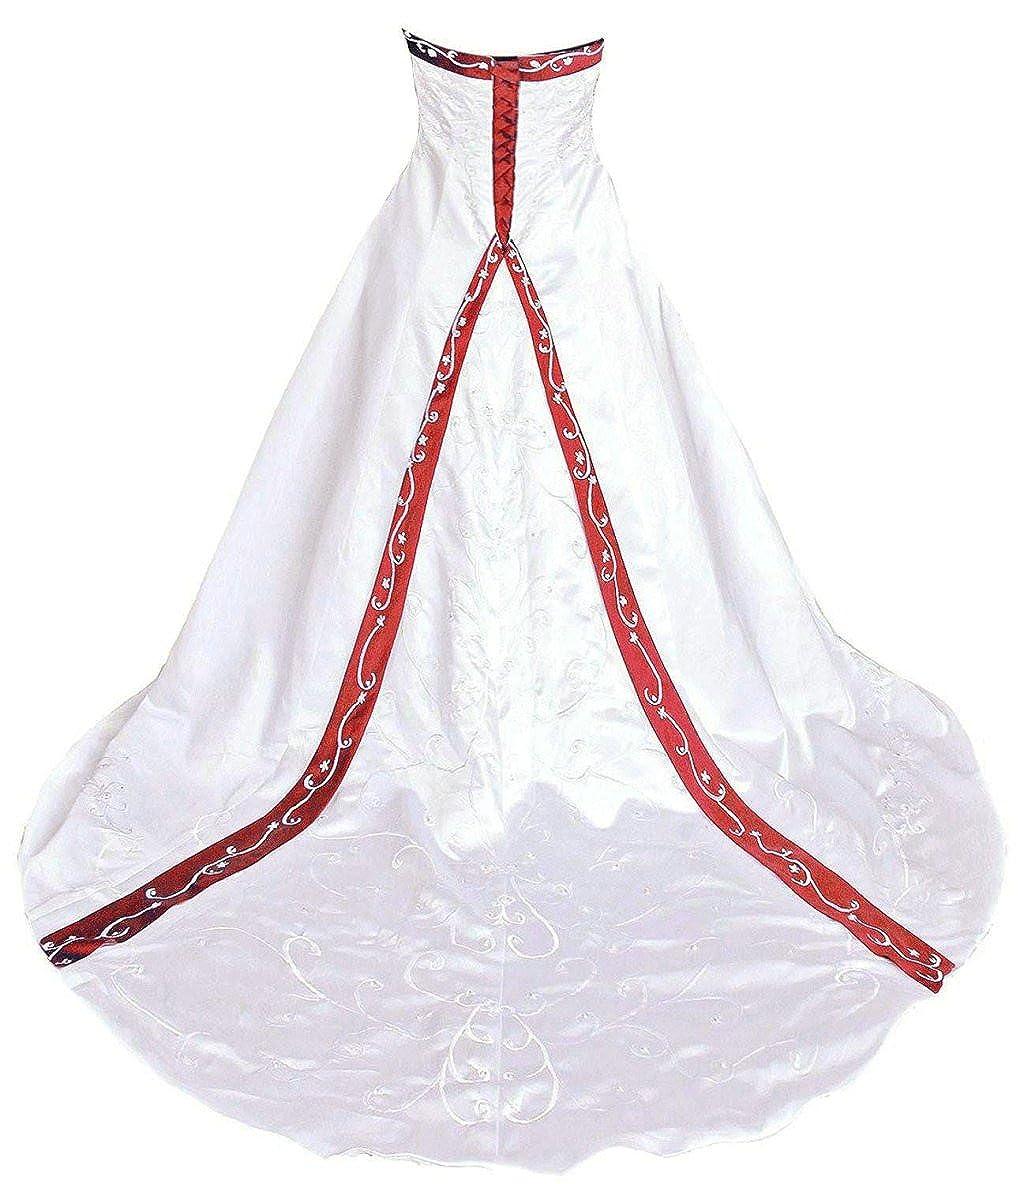 Ivory & Red Vantexi Women's Elegant Strapless Embroidery Wedding Dress Bridal Gown